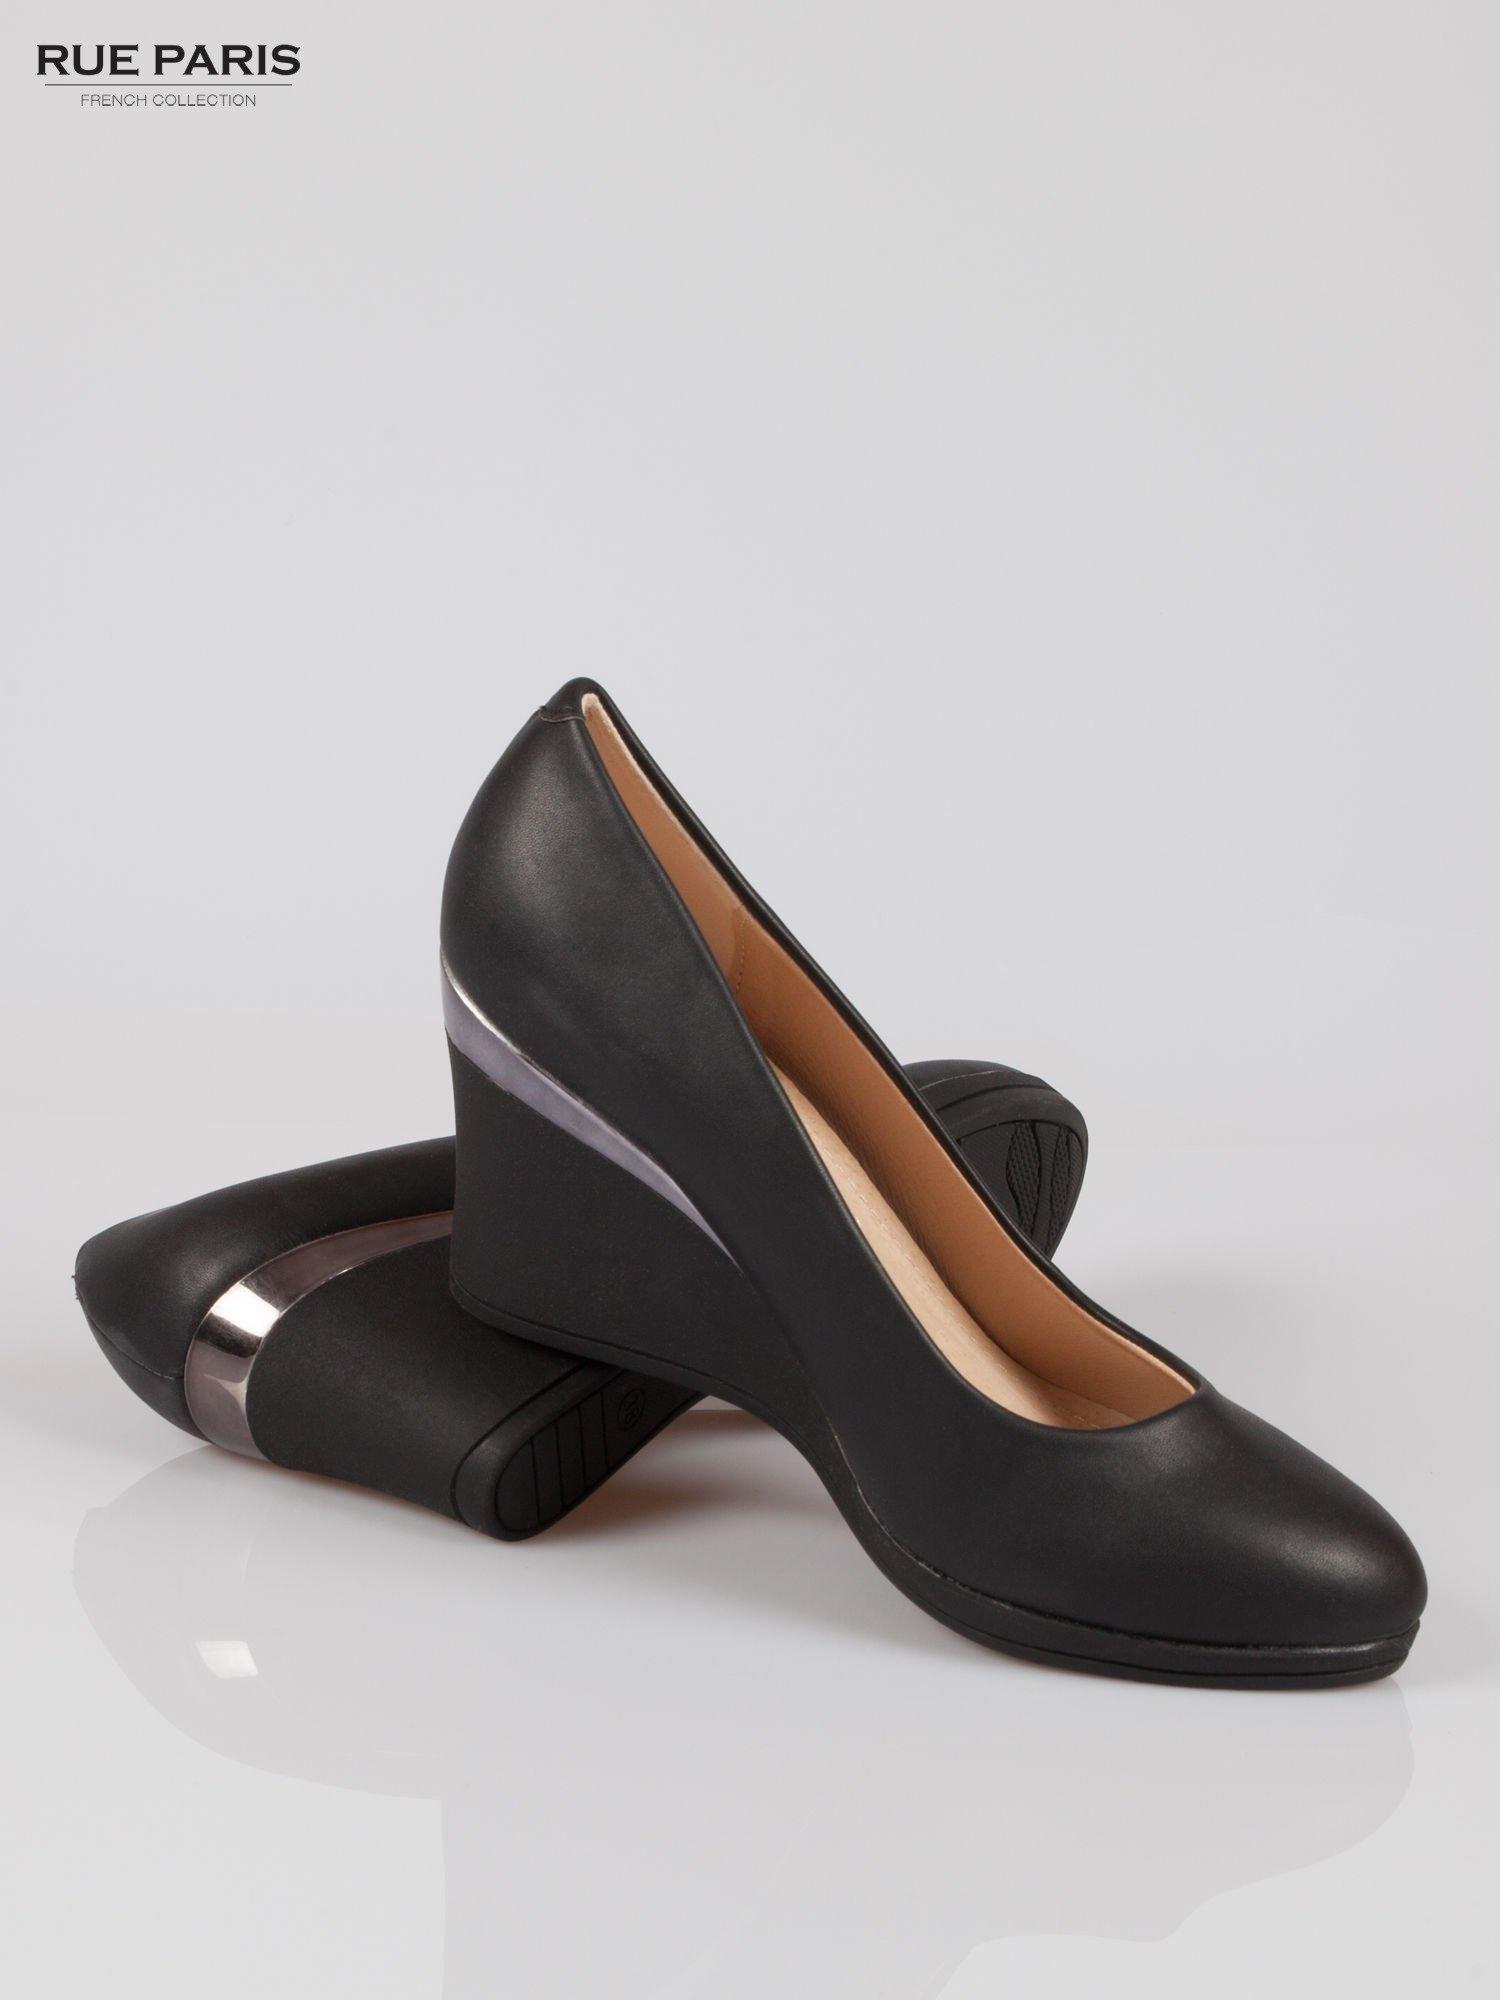 Czarne koturny faux leather Marika ze srebrnym detalem                                  zdj.                                  4